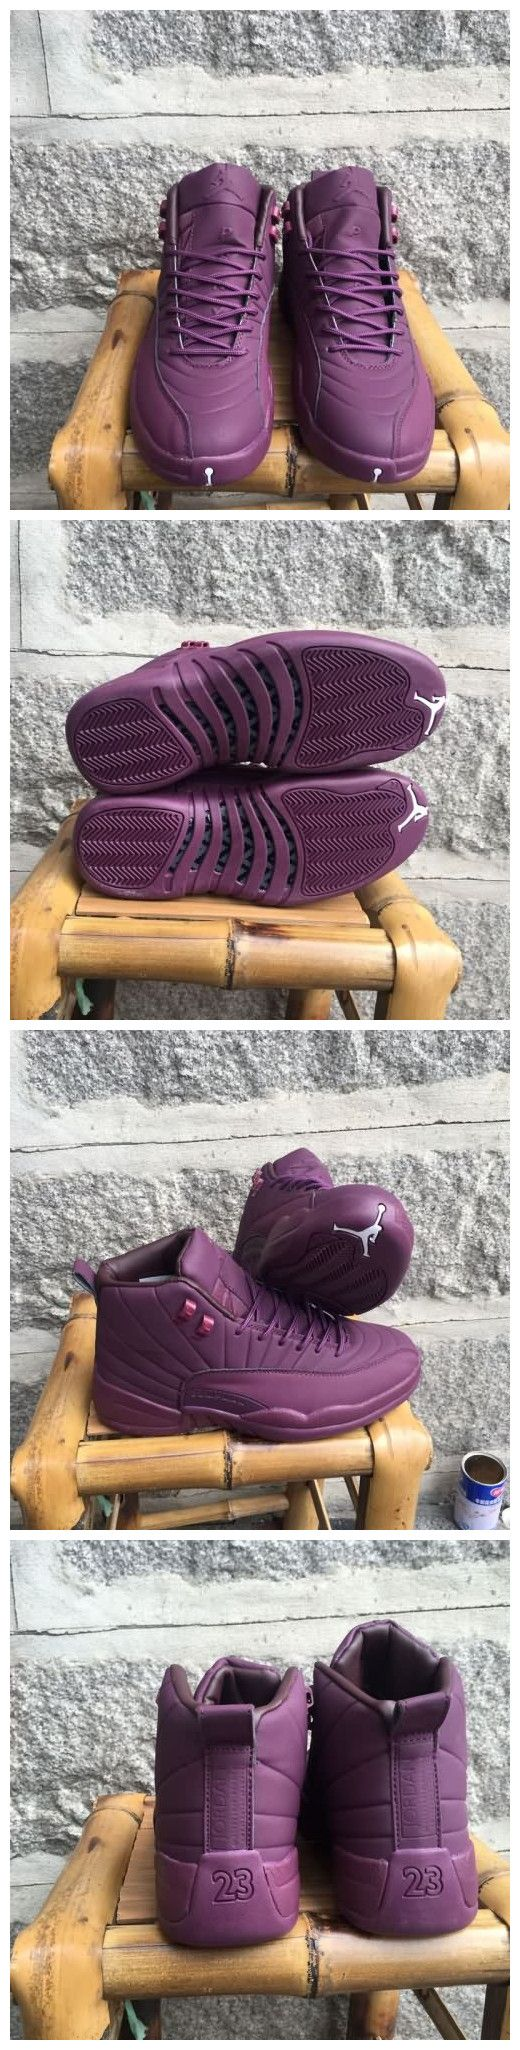 PSNY Air Jordan 12 A Men's shoes Free Shipping WhatsApp:86 13328373859